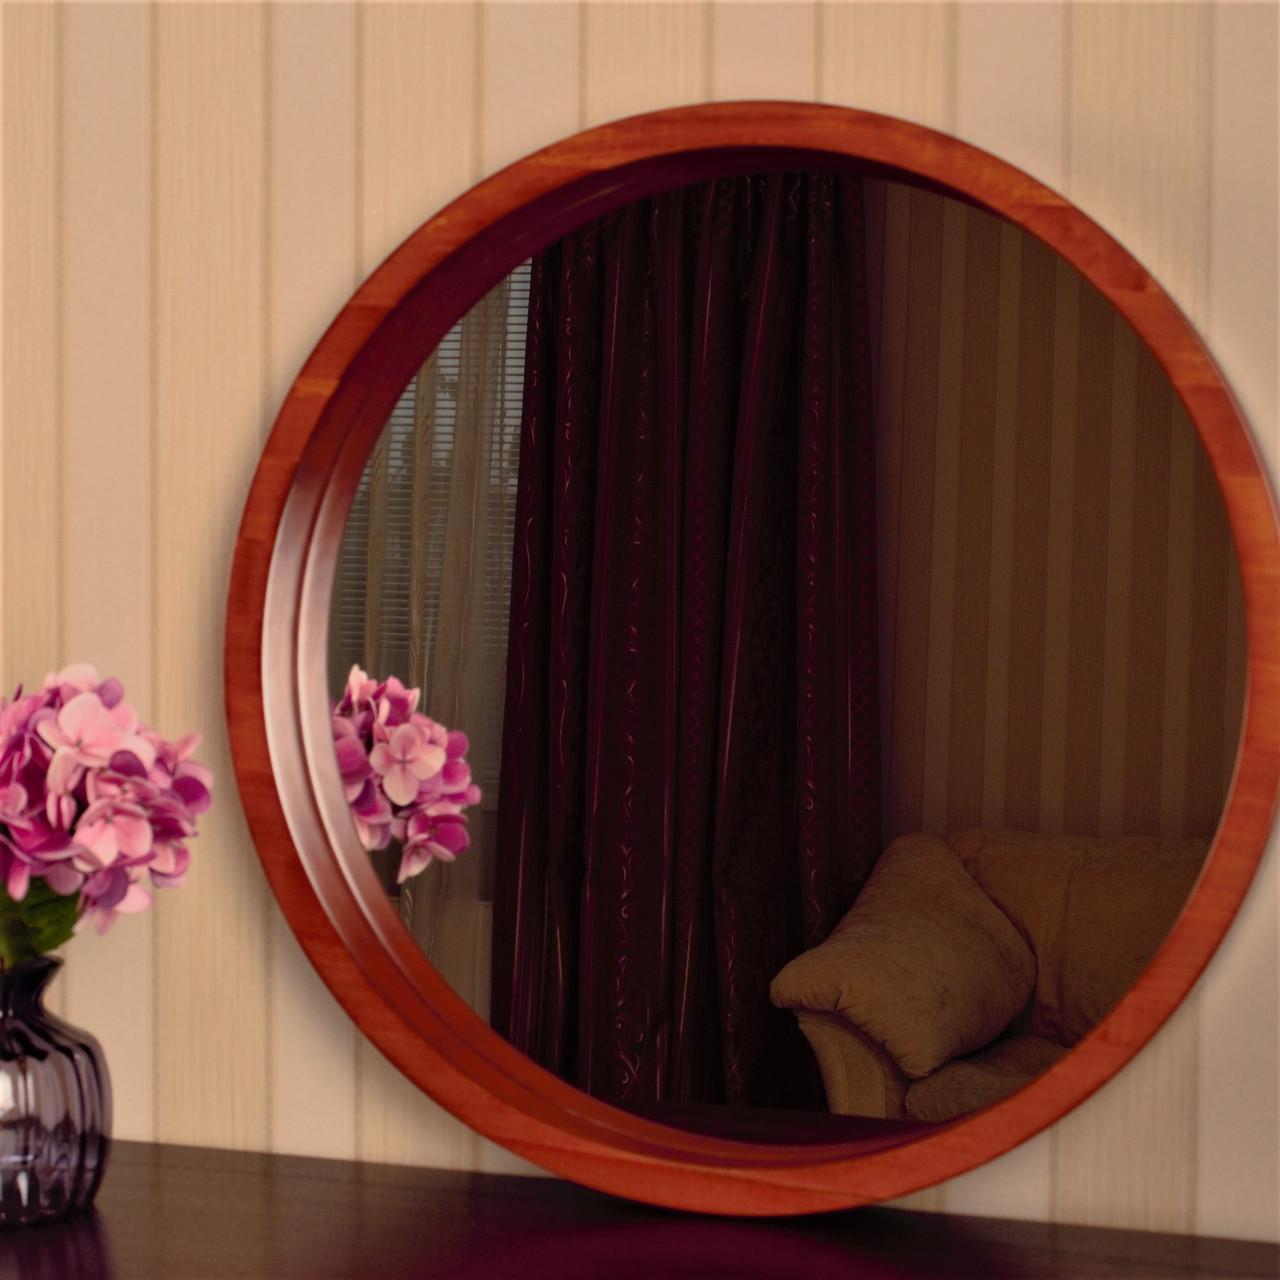 "Круглое зеркало деревянной рамке/Диаметр 590 мм/ Зеркало в дереве цвет ""Вишня""/ Код MDD 2.1/4"